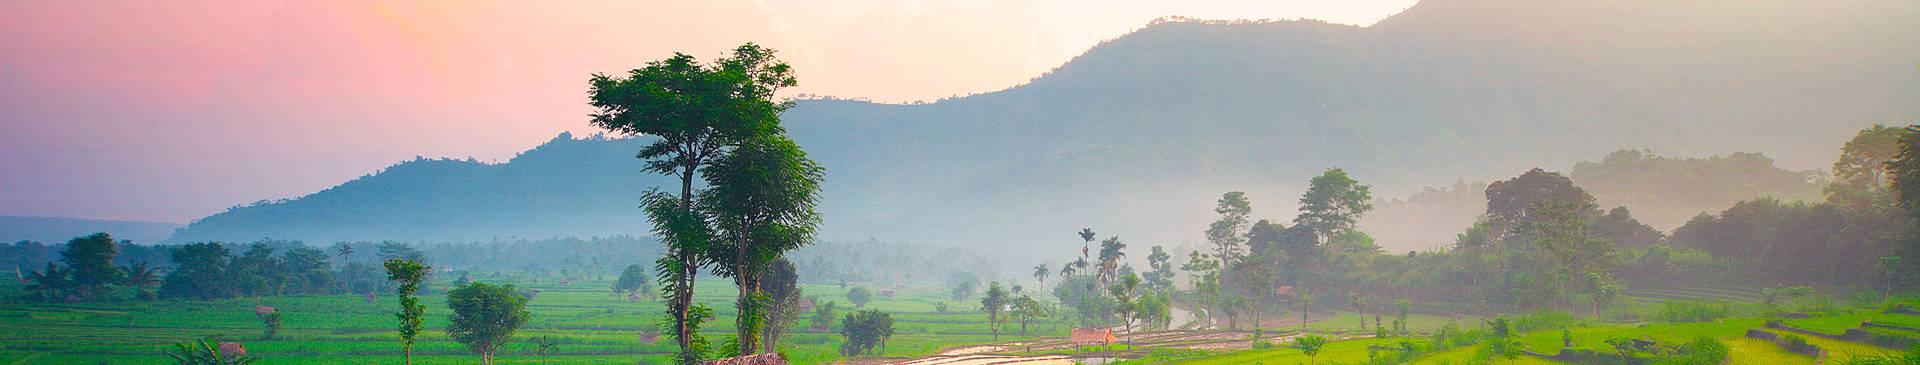 Voyage nature à Bali